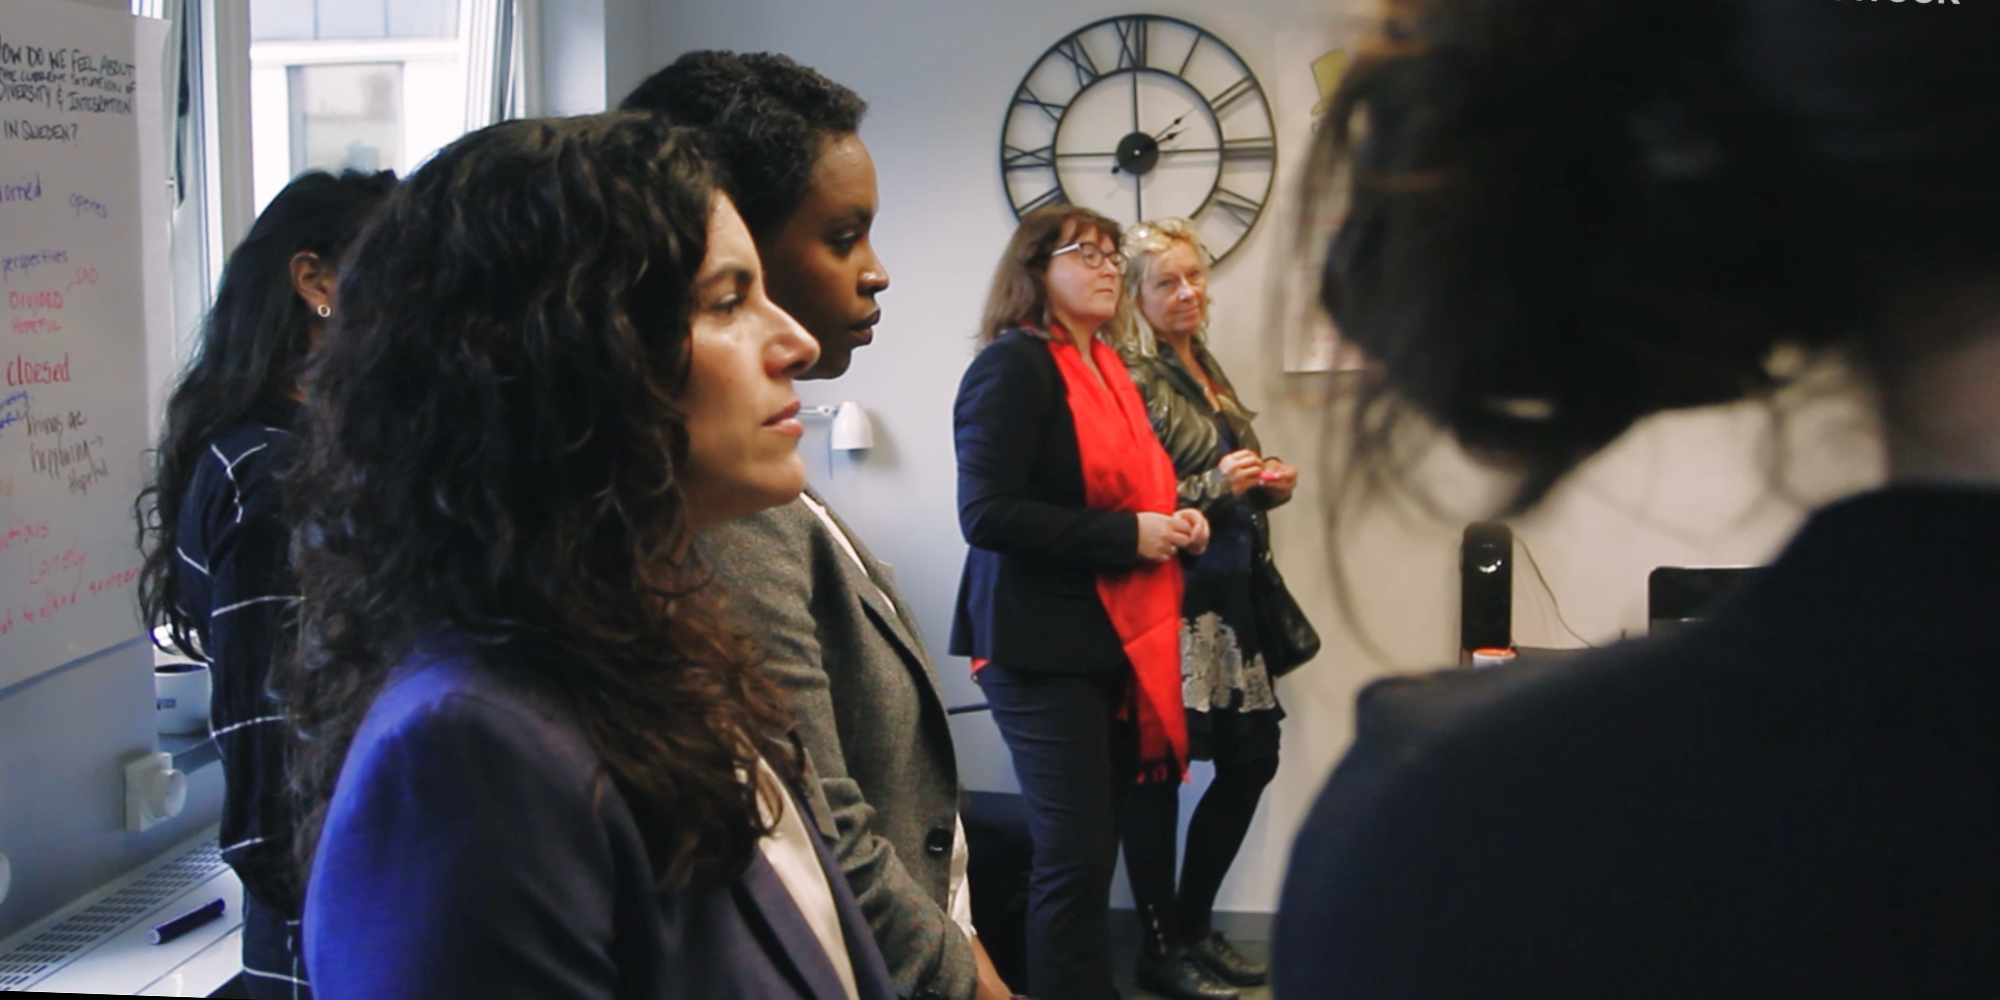 Lorensbergs: Diversity and Integration